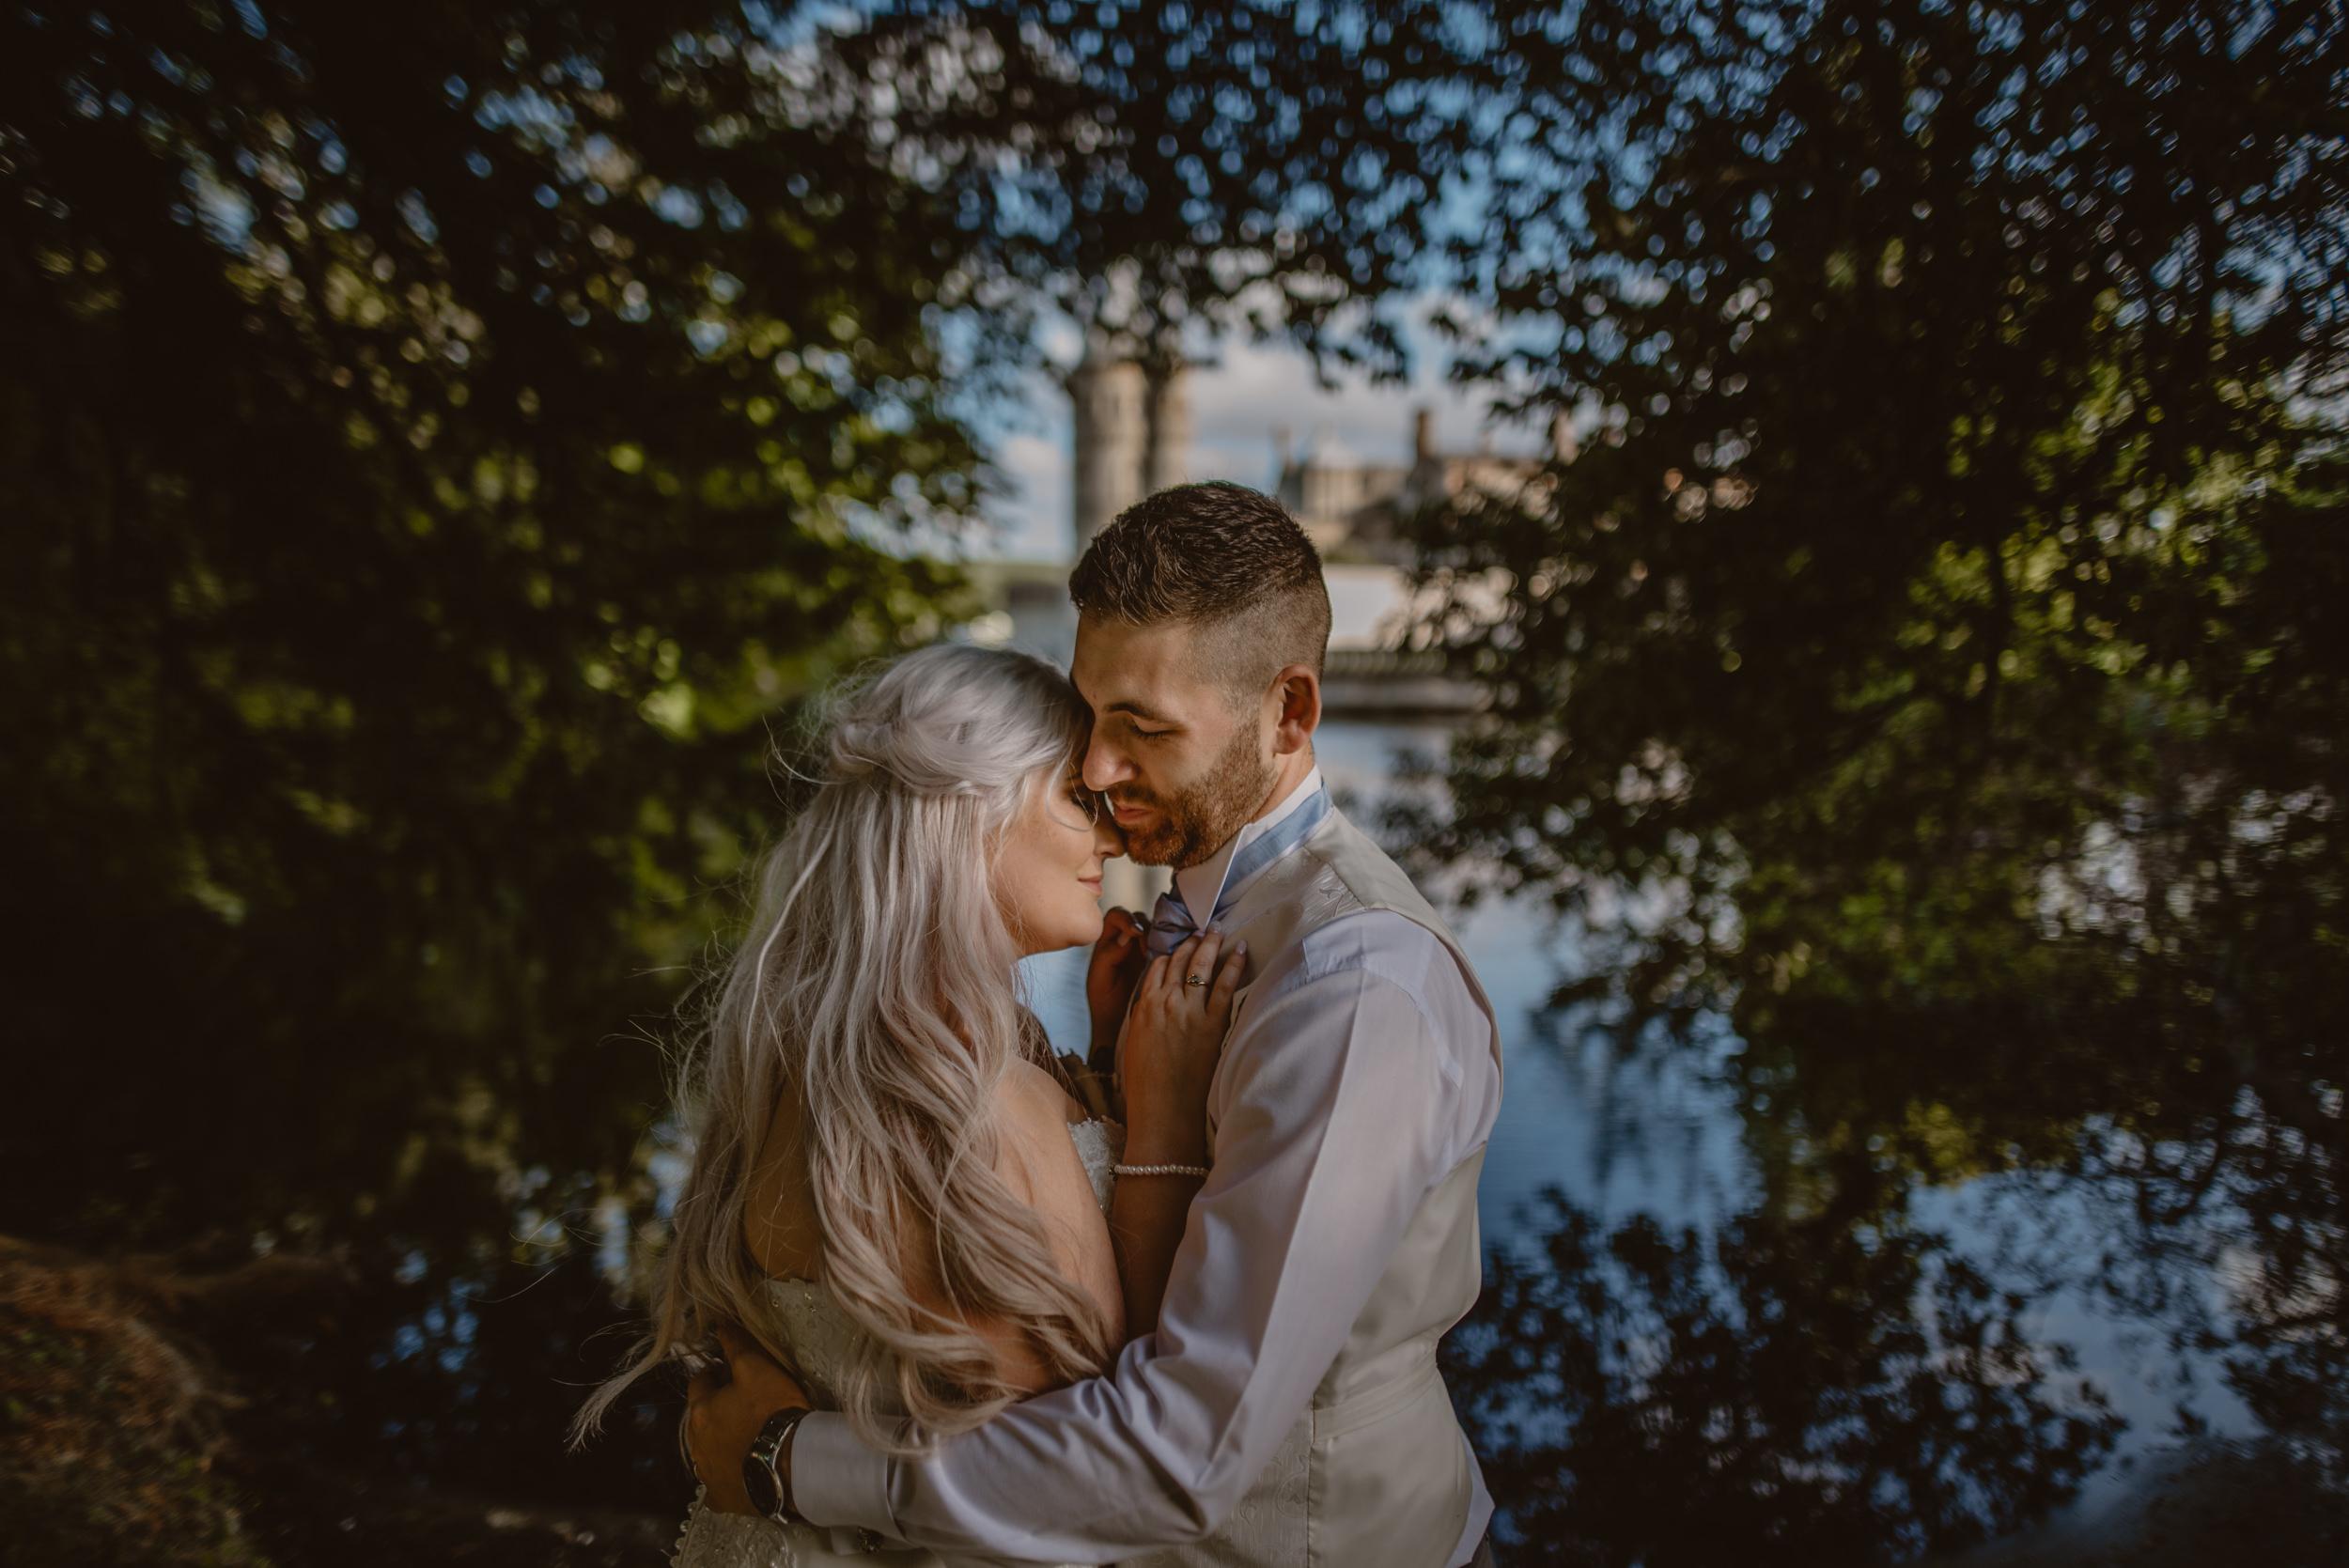 Rachel-and-James-Wedding-Horsley-Towers-State-Manu-Mendoza-Wedding-Photography-496.jpg